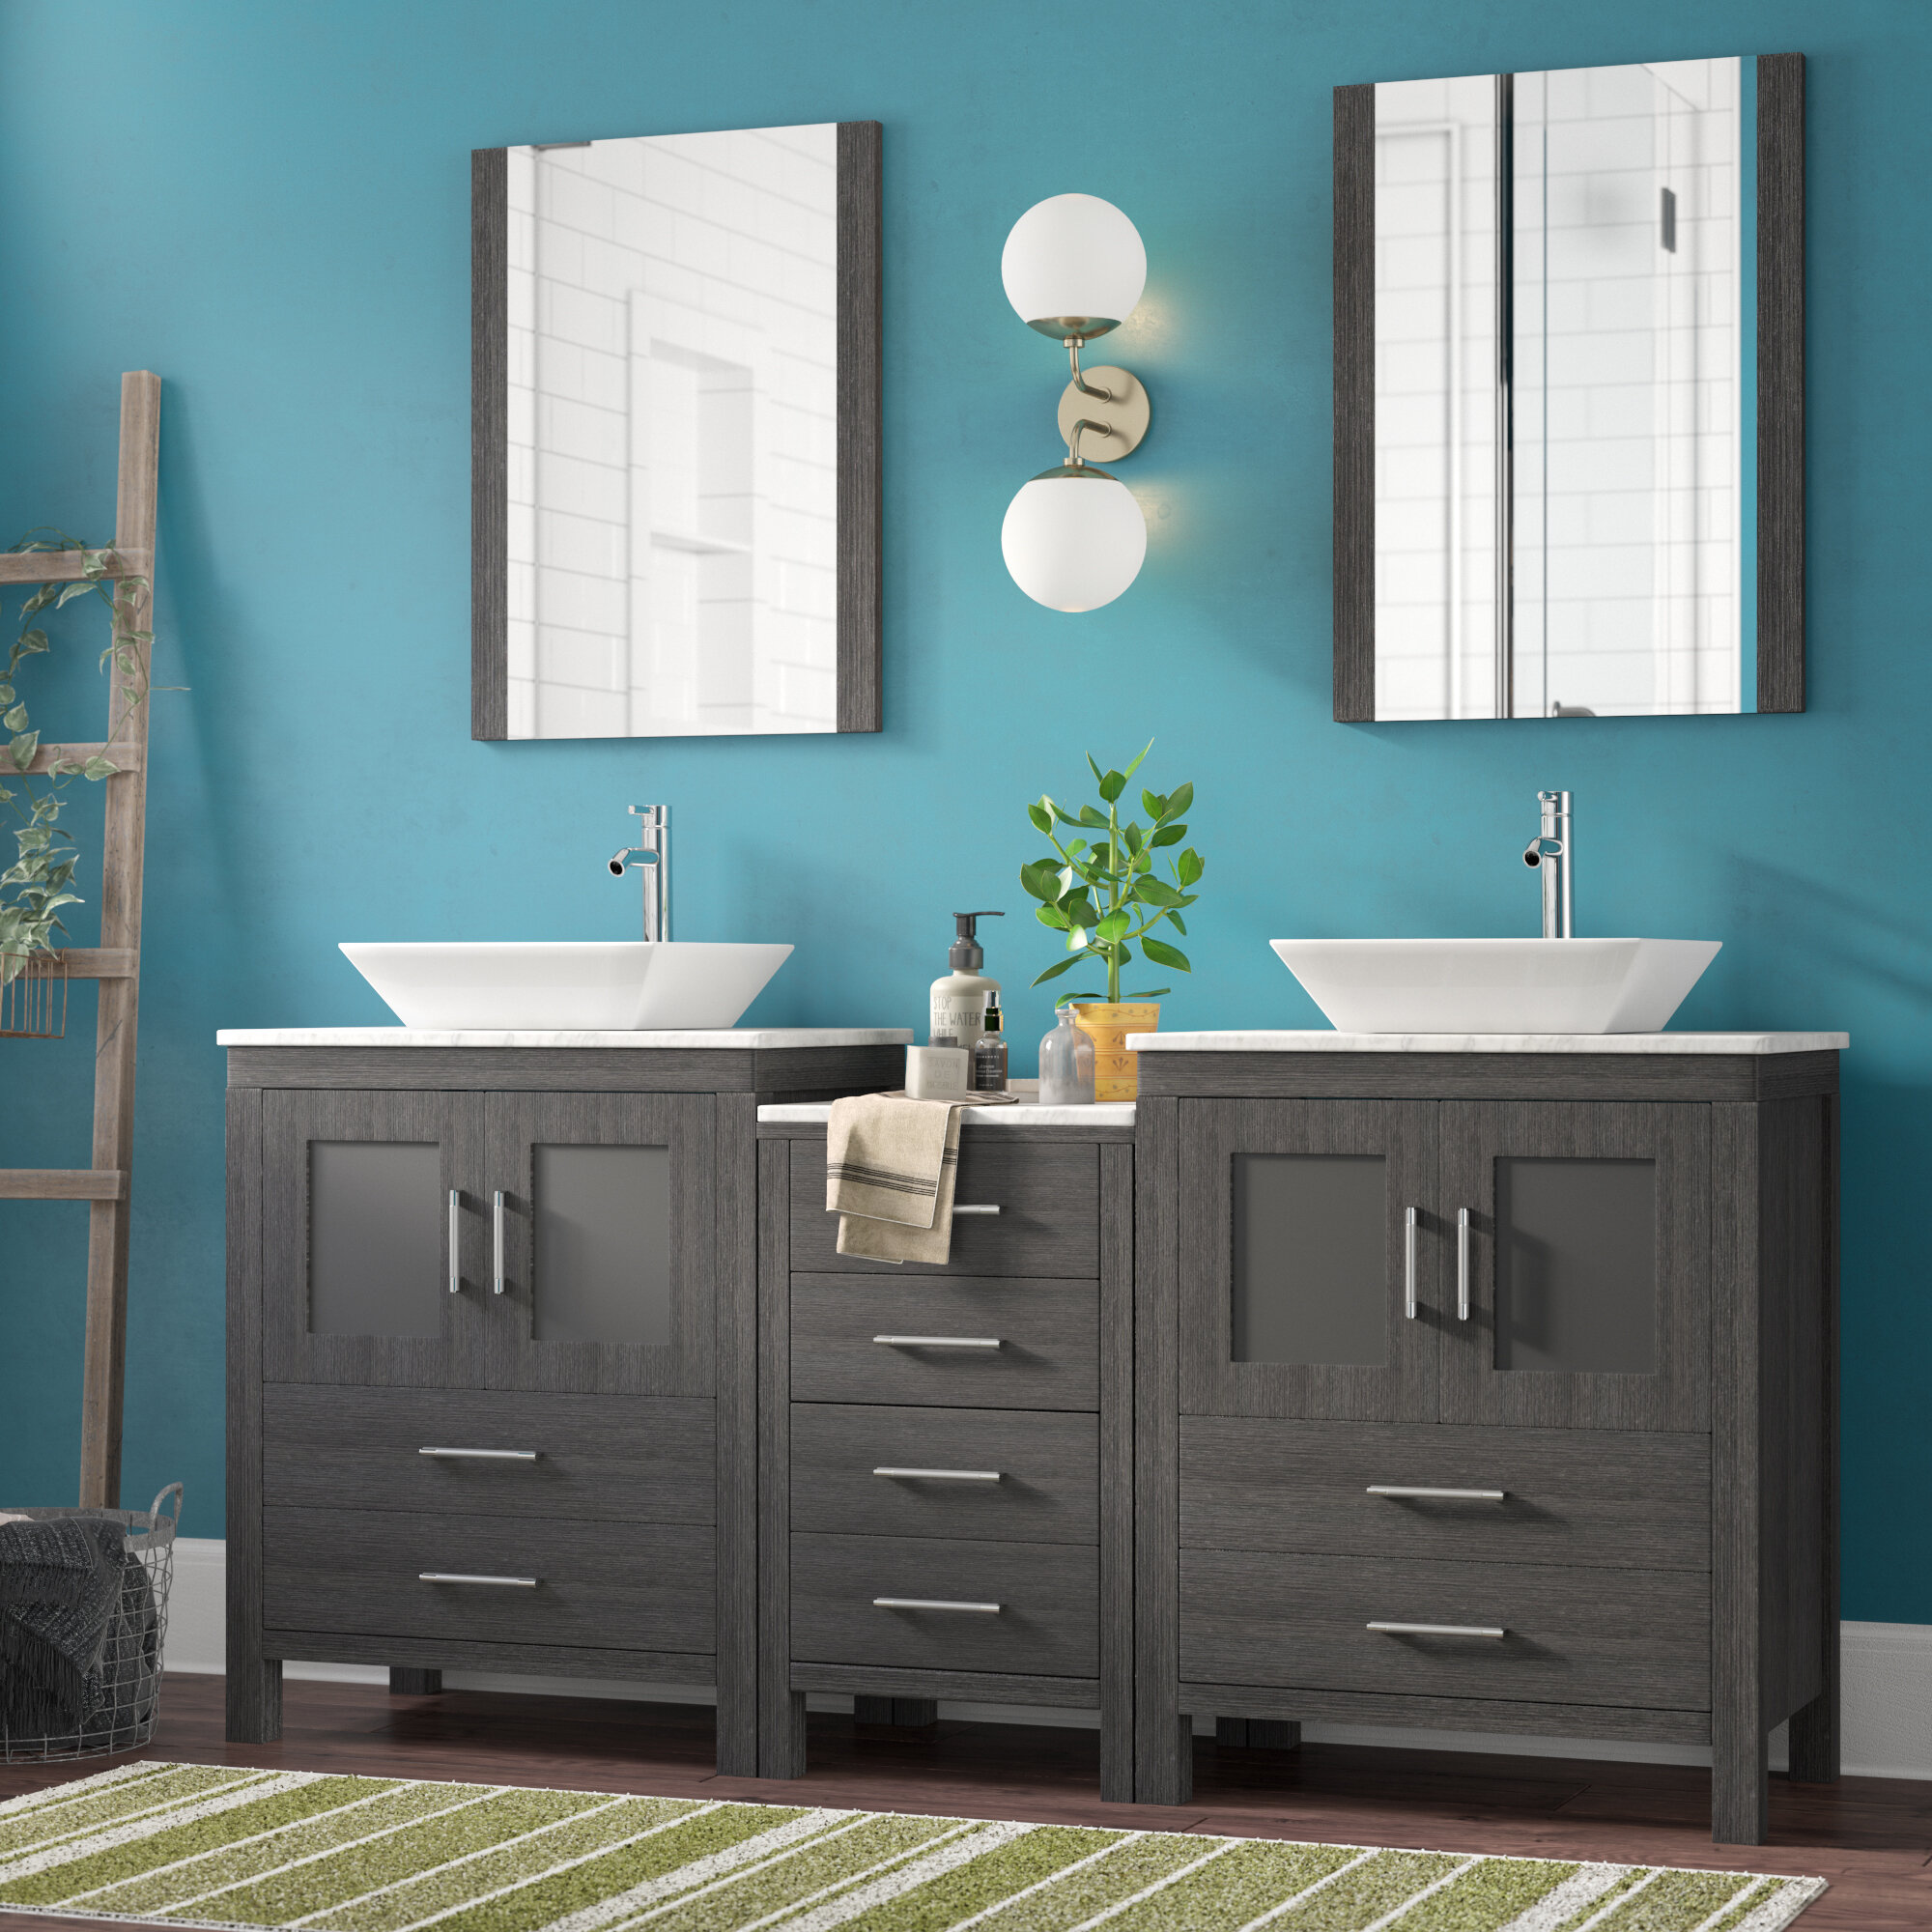 Mercury Row Cartagena 75 Double Bathroom Vanity Set With White Marble Top And Mirror Reviews Wayfair